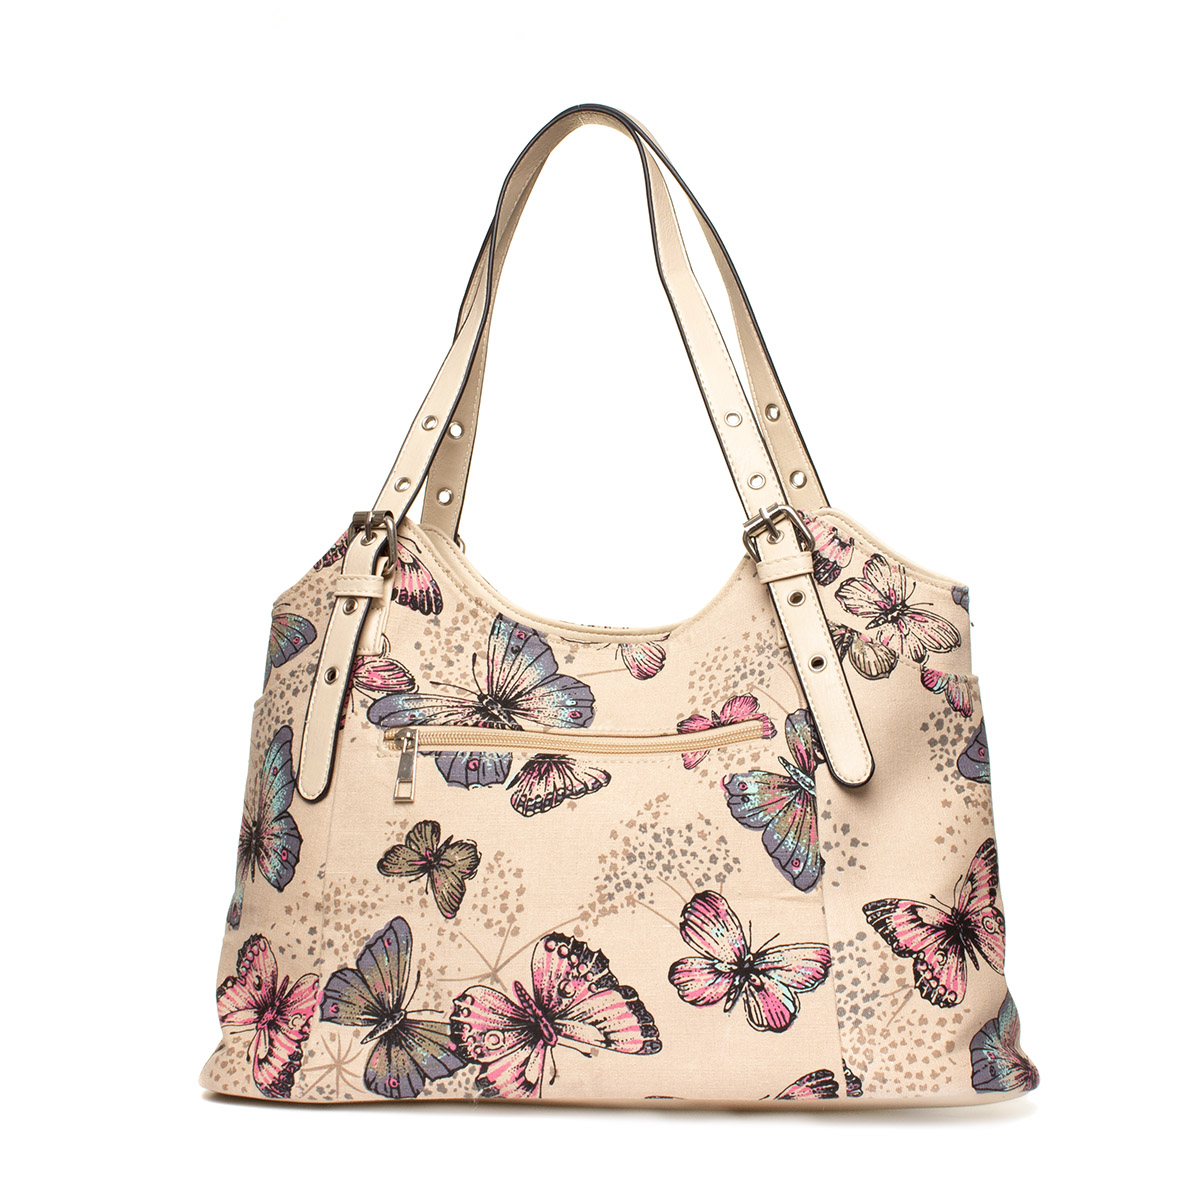 Lilley Beige Butterfly Printed Handbag